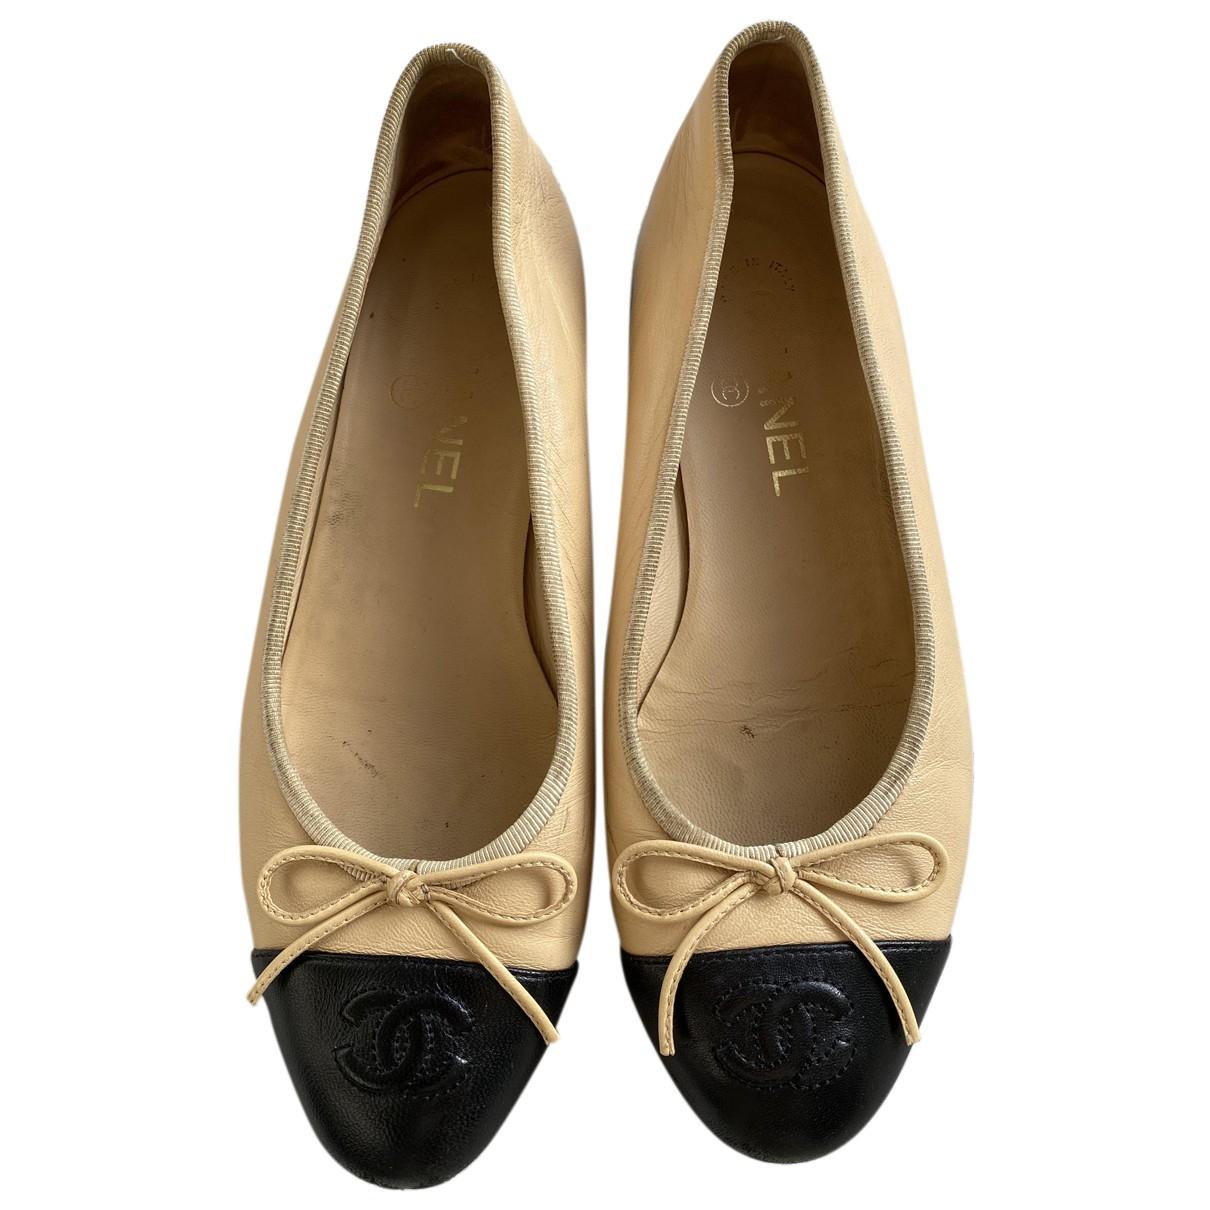 Chanel - Ballerines   pour femme en cuir - beige